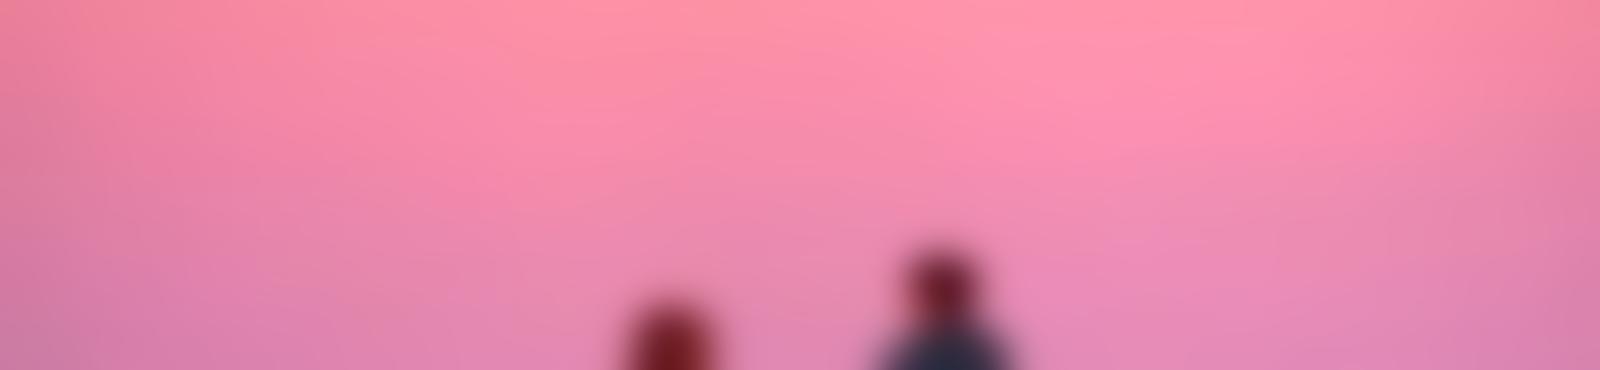 Blurred 671f1a49 b046 4362 9717 0ee1e35f8209